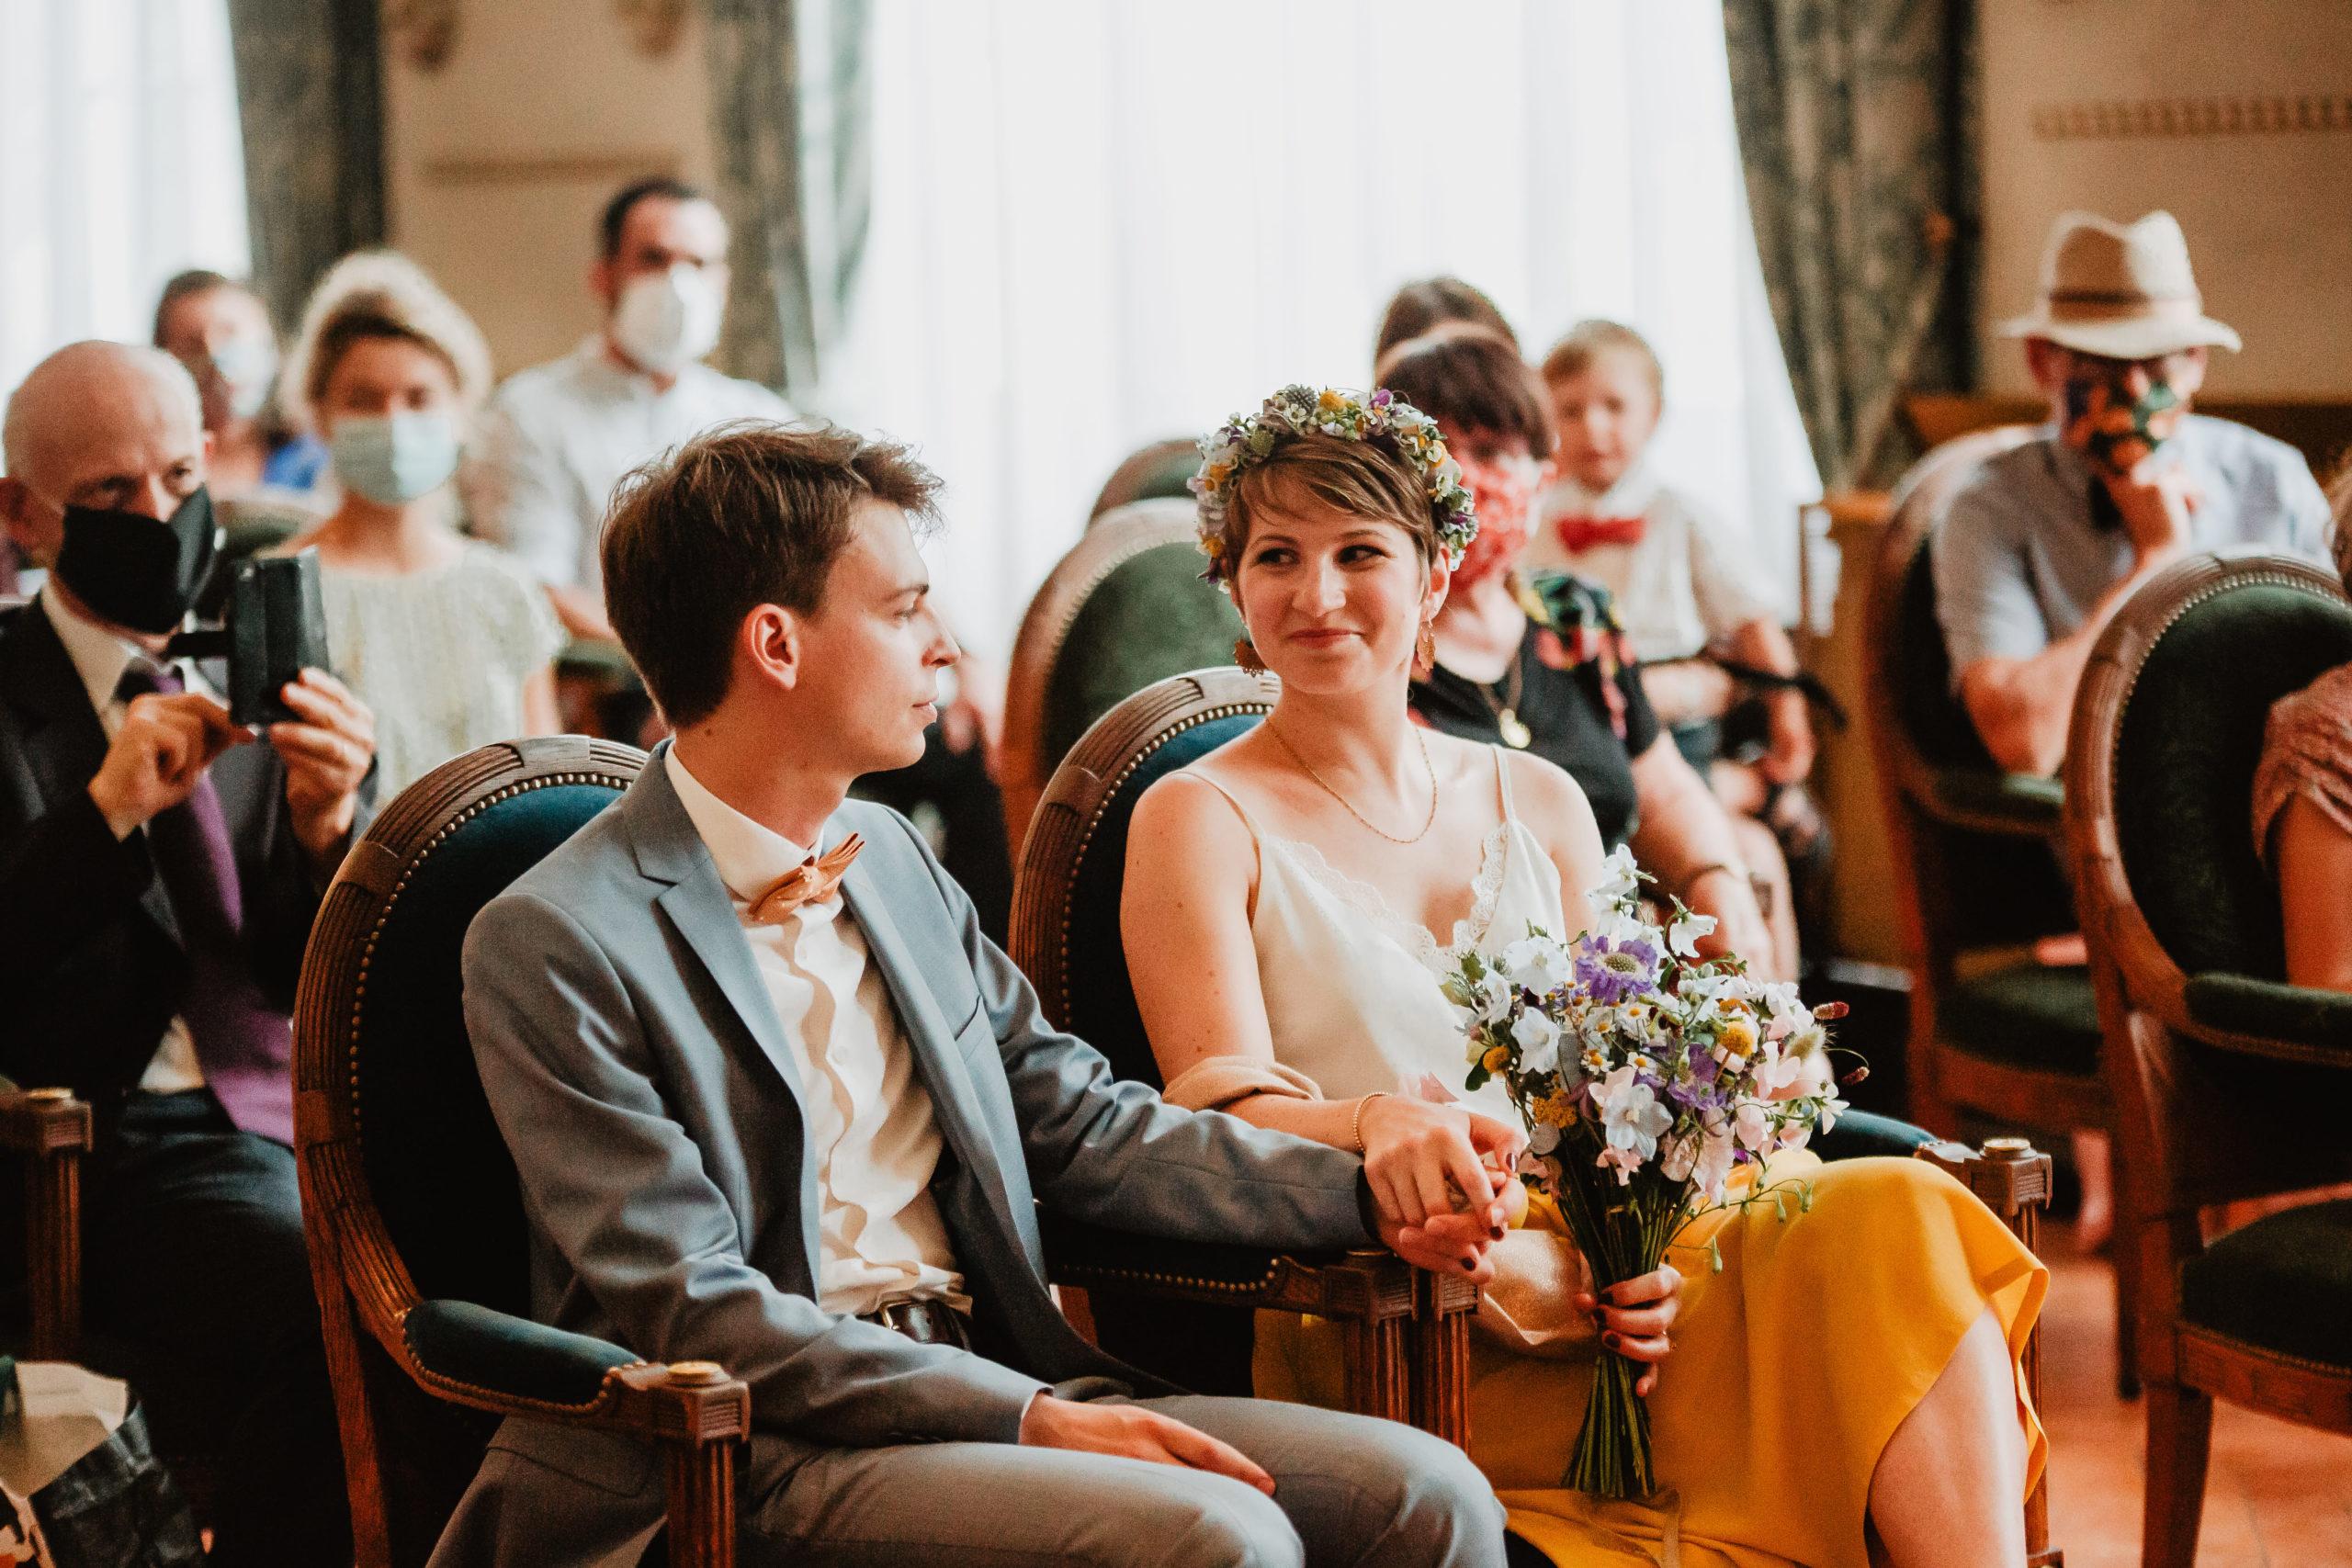 cérémonie civile mariage mairie lyon 7